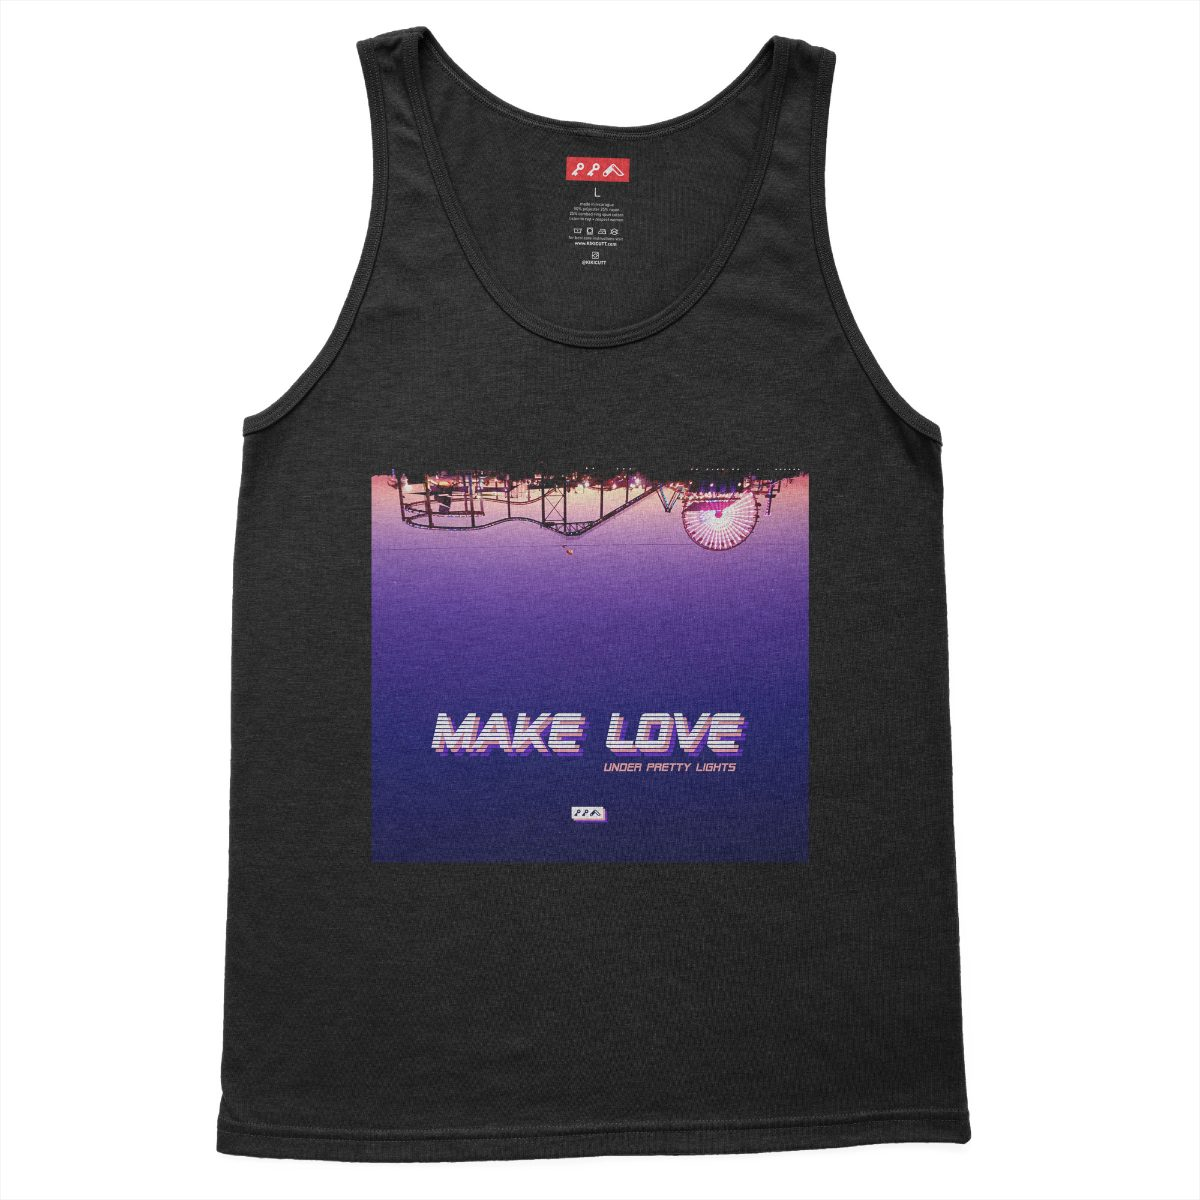 MAKE LOVE under pretty lights santa monica beach tank top charcoal black tri-blend